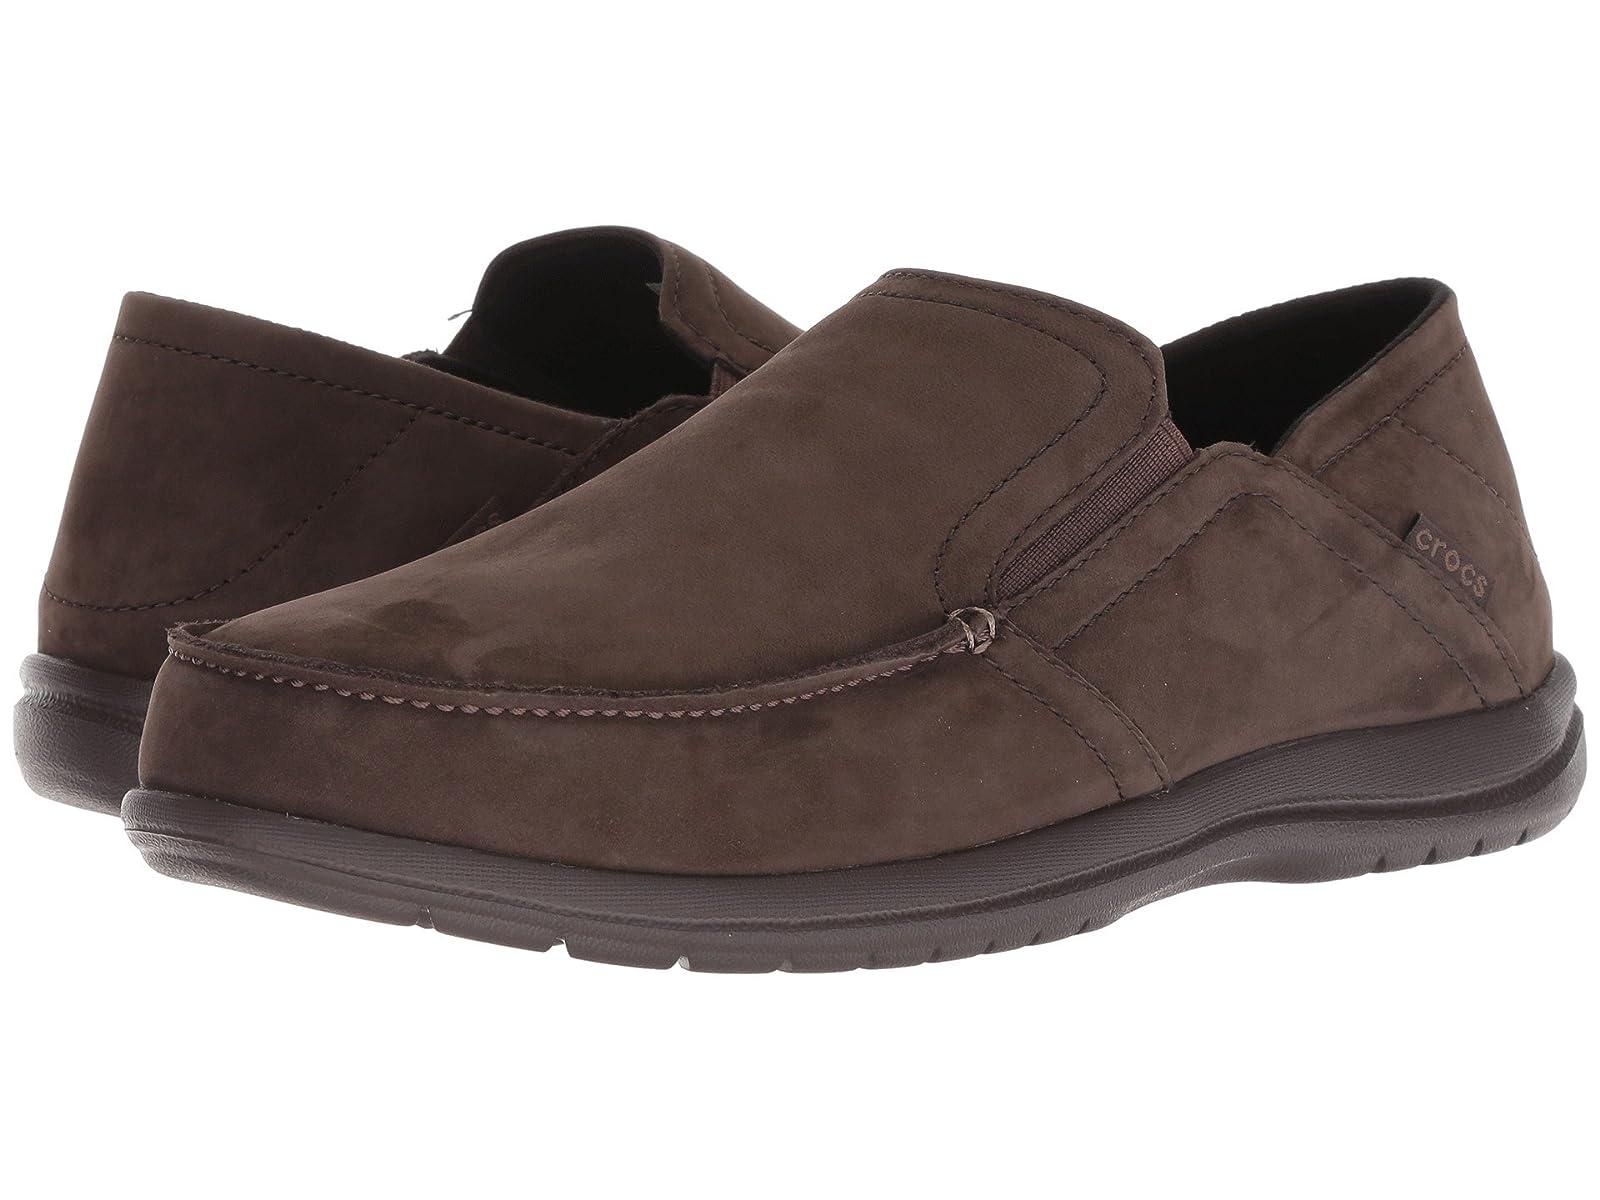 Crocs Santa Cruz Convertible Leather Slip-OnAtmospheric grades have affordable shoes